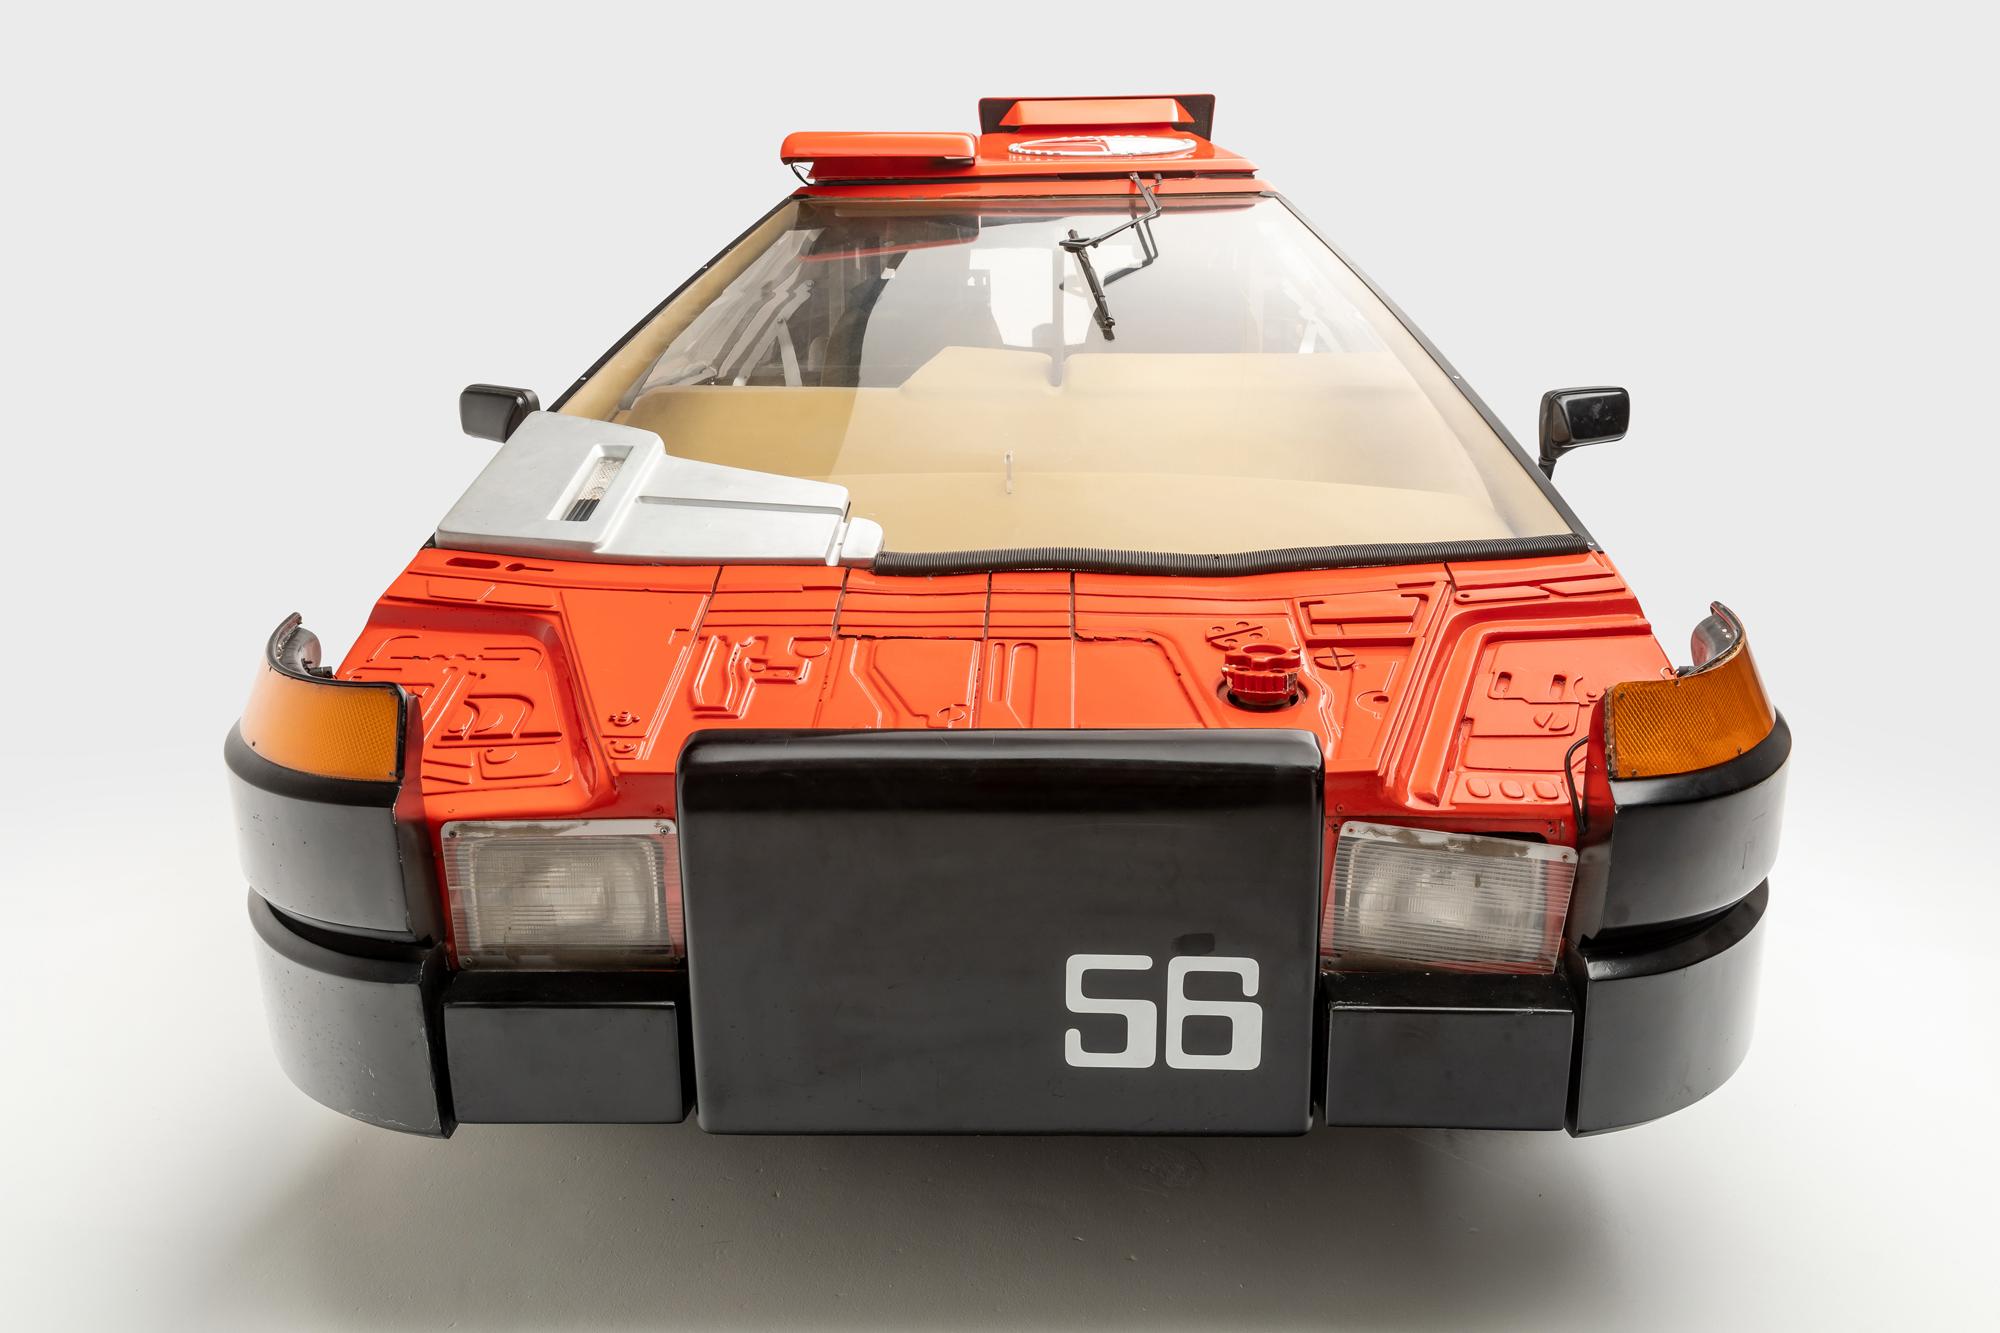 blade-runner-sedan-2-2000